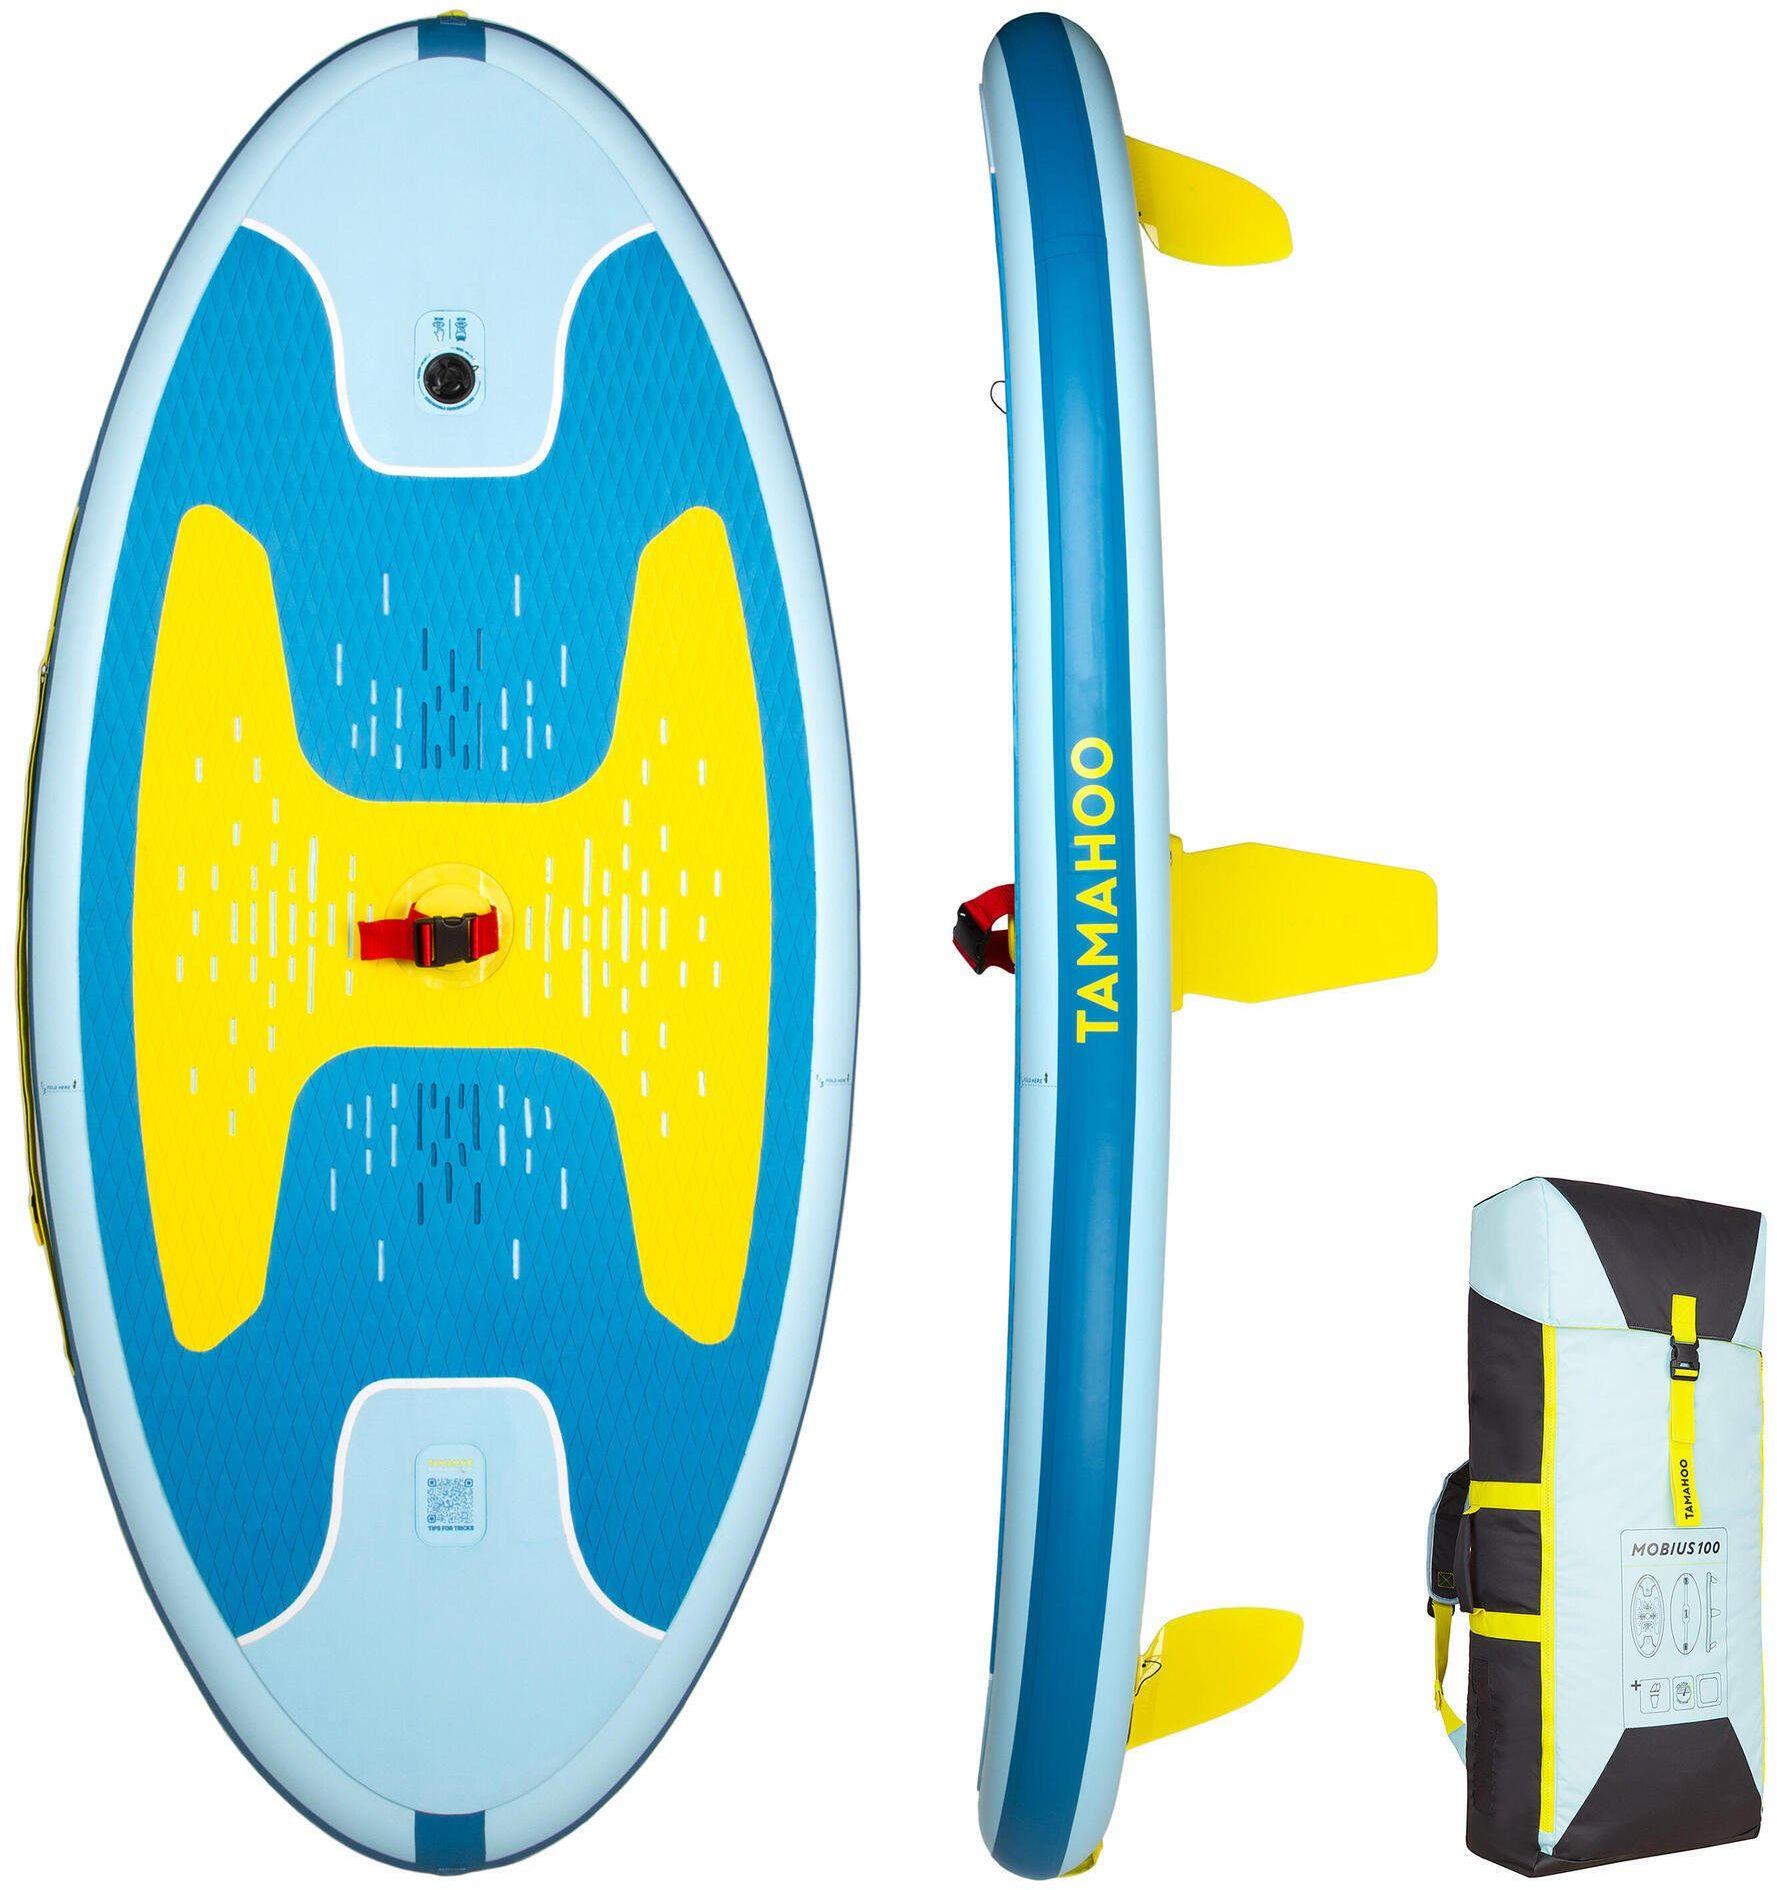 Deska pneumatyczna do windsurfingu Tamahoo 100